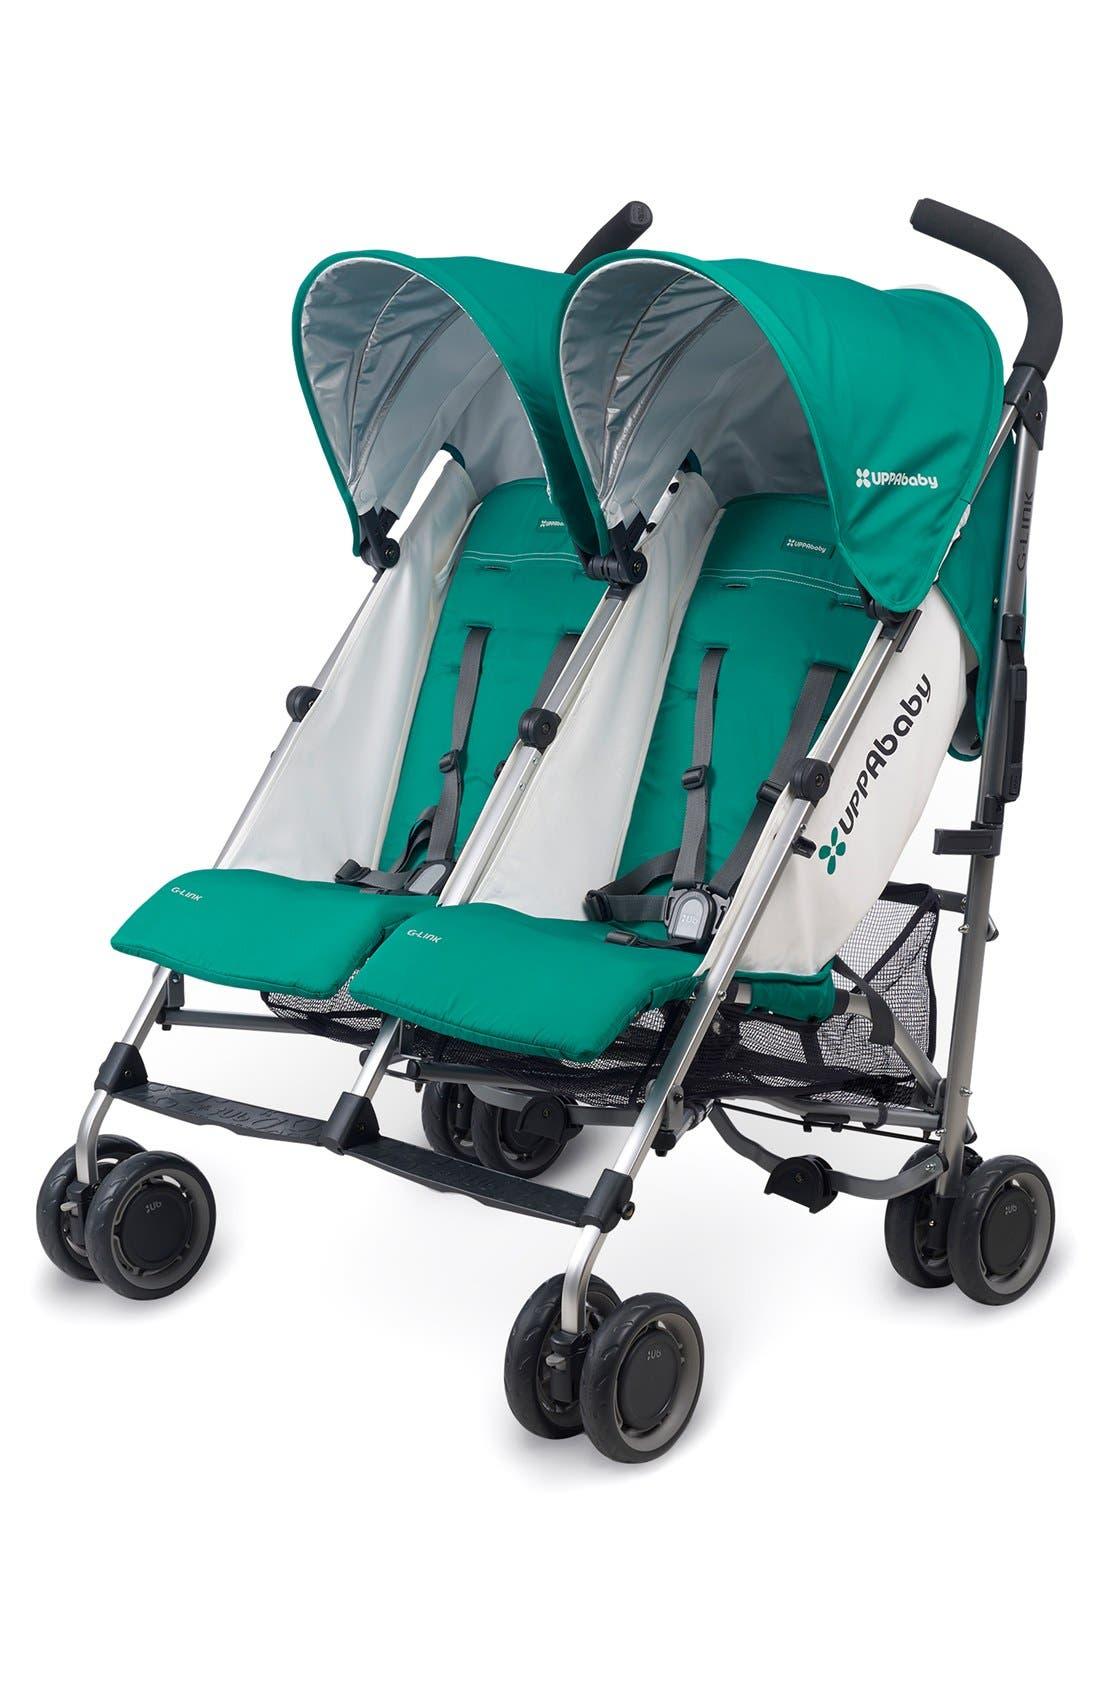 G-LINK Ella Aluminum Frame Reclining Side by Side Umbrella Stroller,                         Main,                         color, Jade